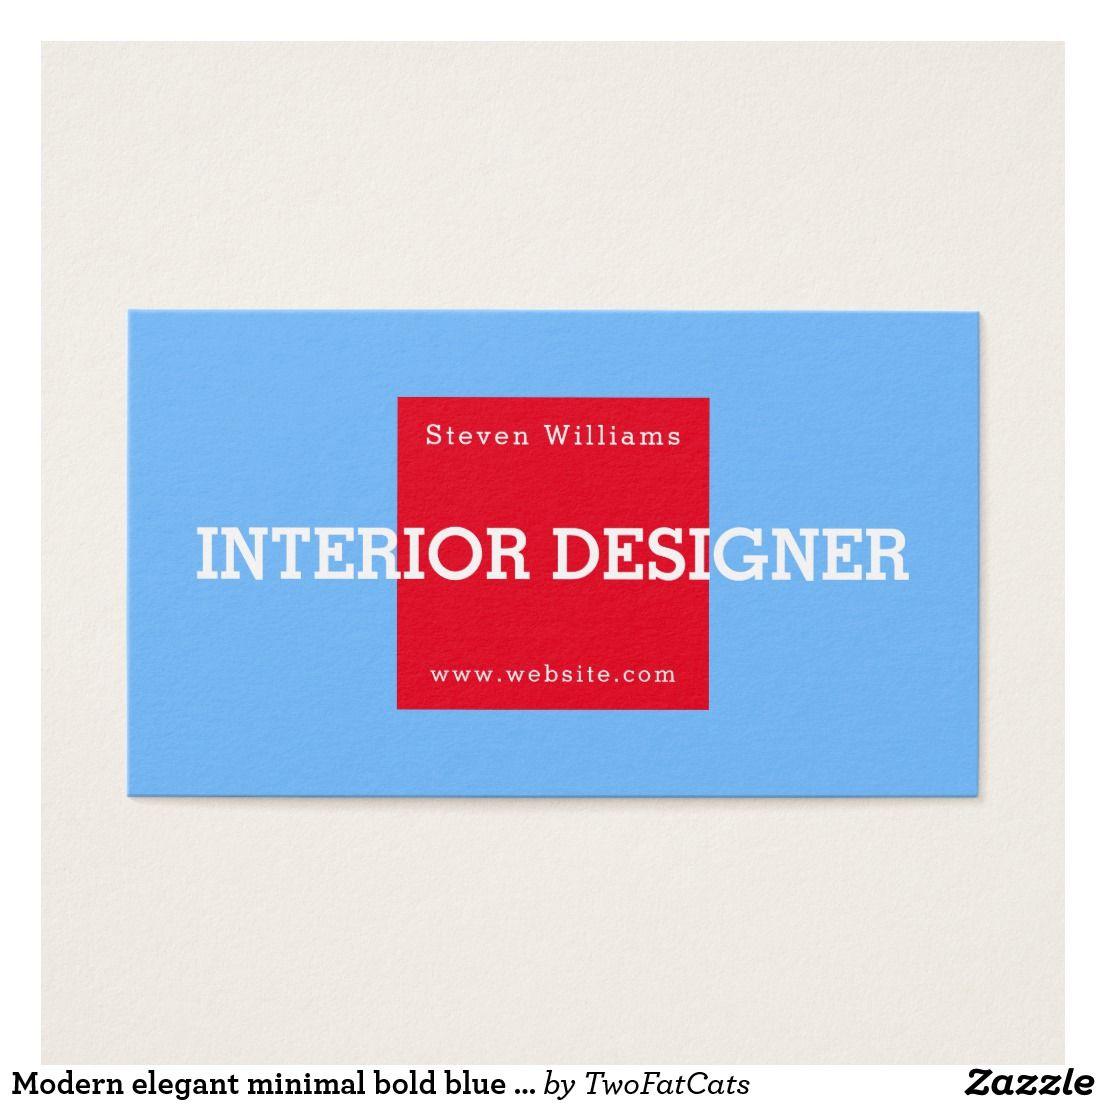 Modern elegant minimal bold blue red business card